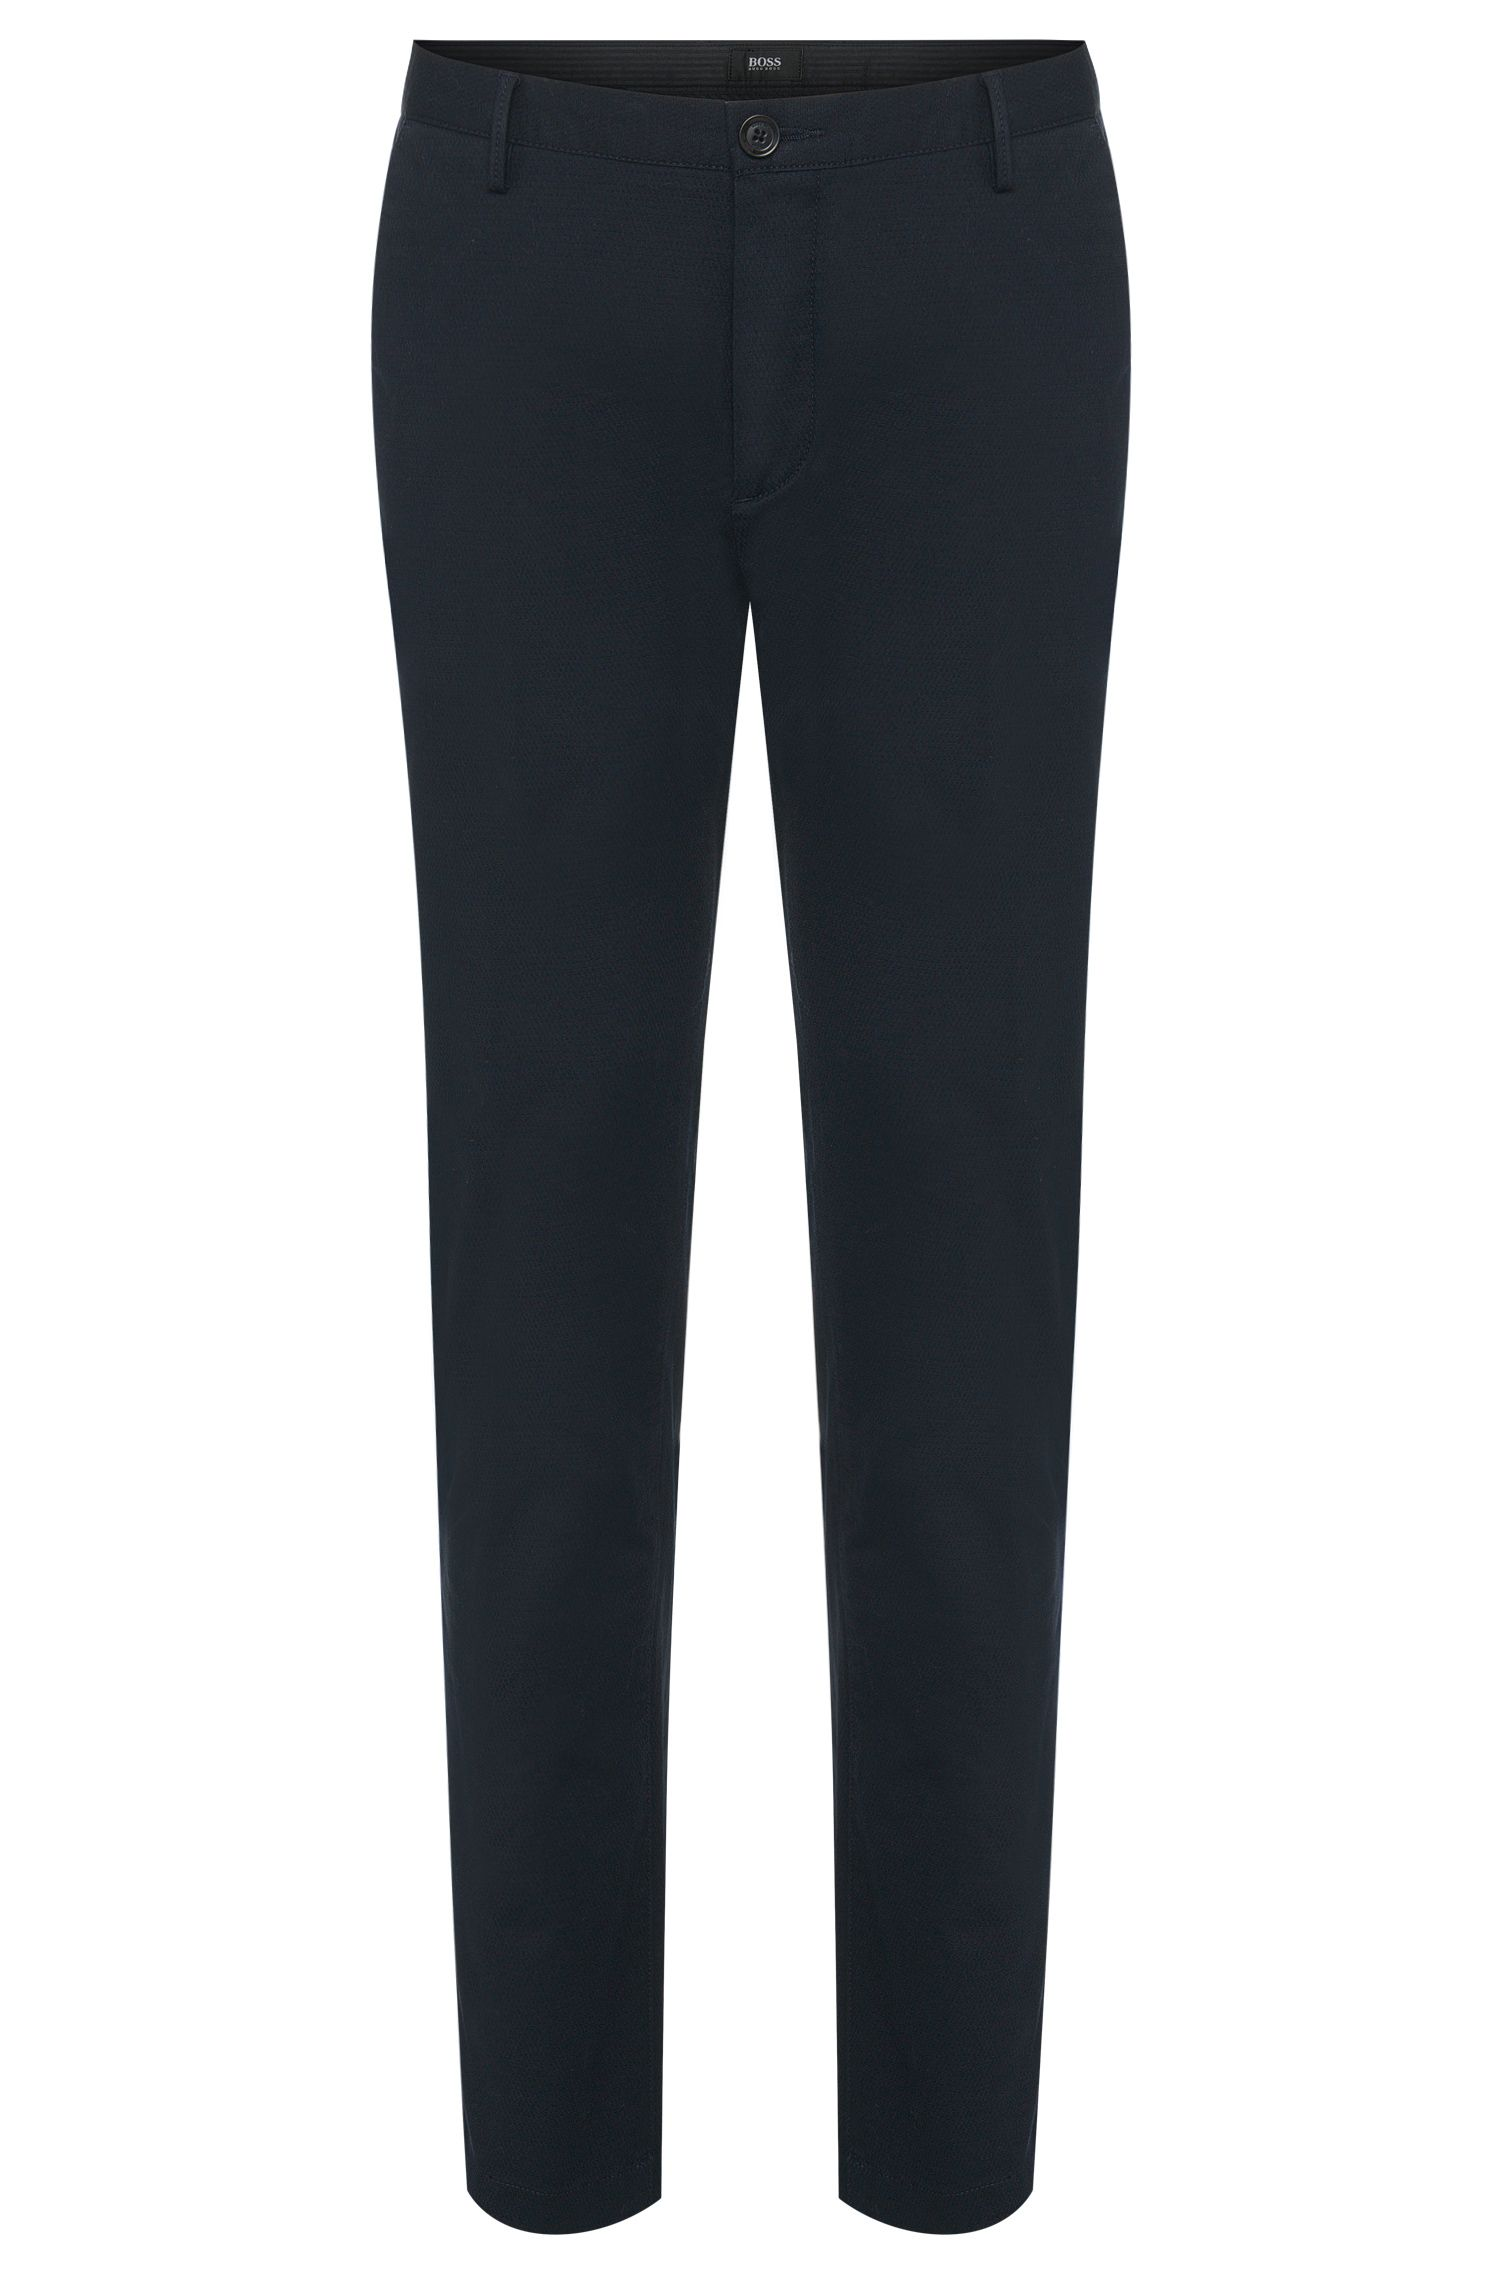 'Rice-W' | Slim Fit, Stretch Cotton Pants